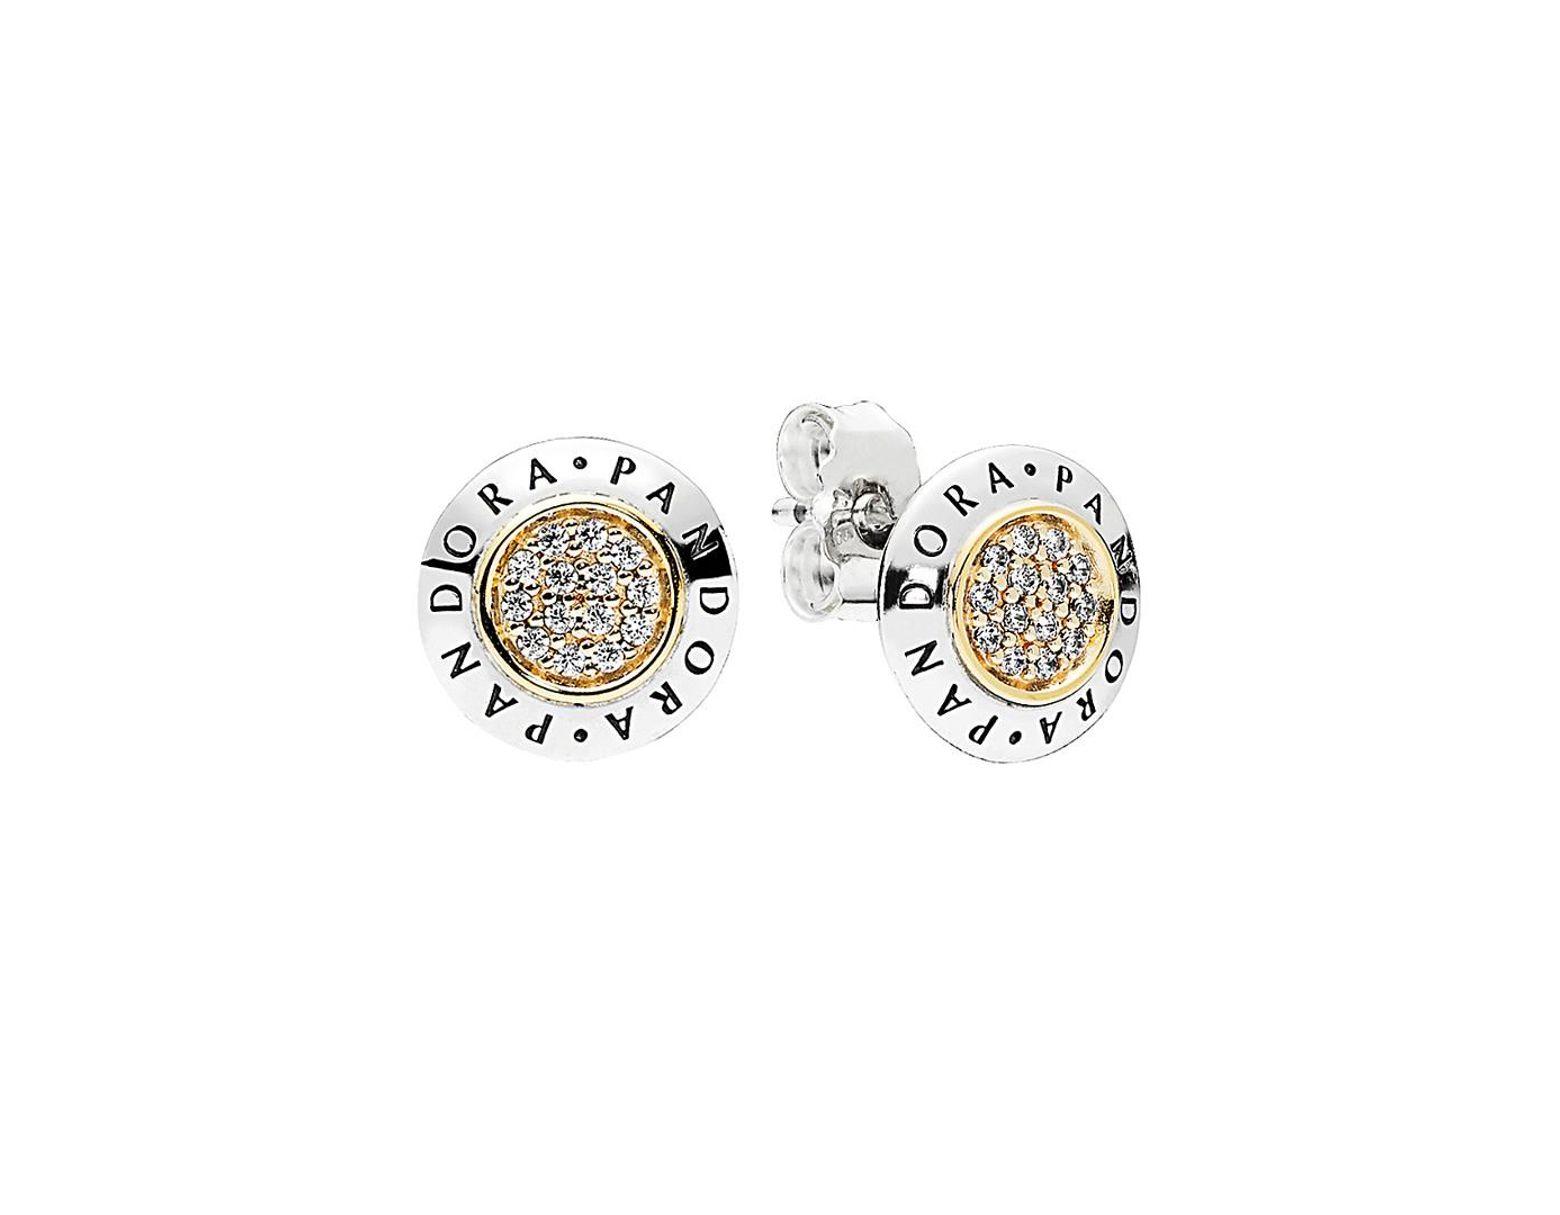 98d39c606 PANDORA Two Tone Cz Signature Stud Earrings in Metallic - Lyst